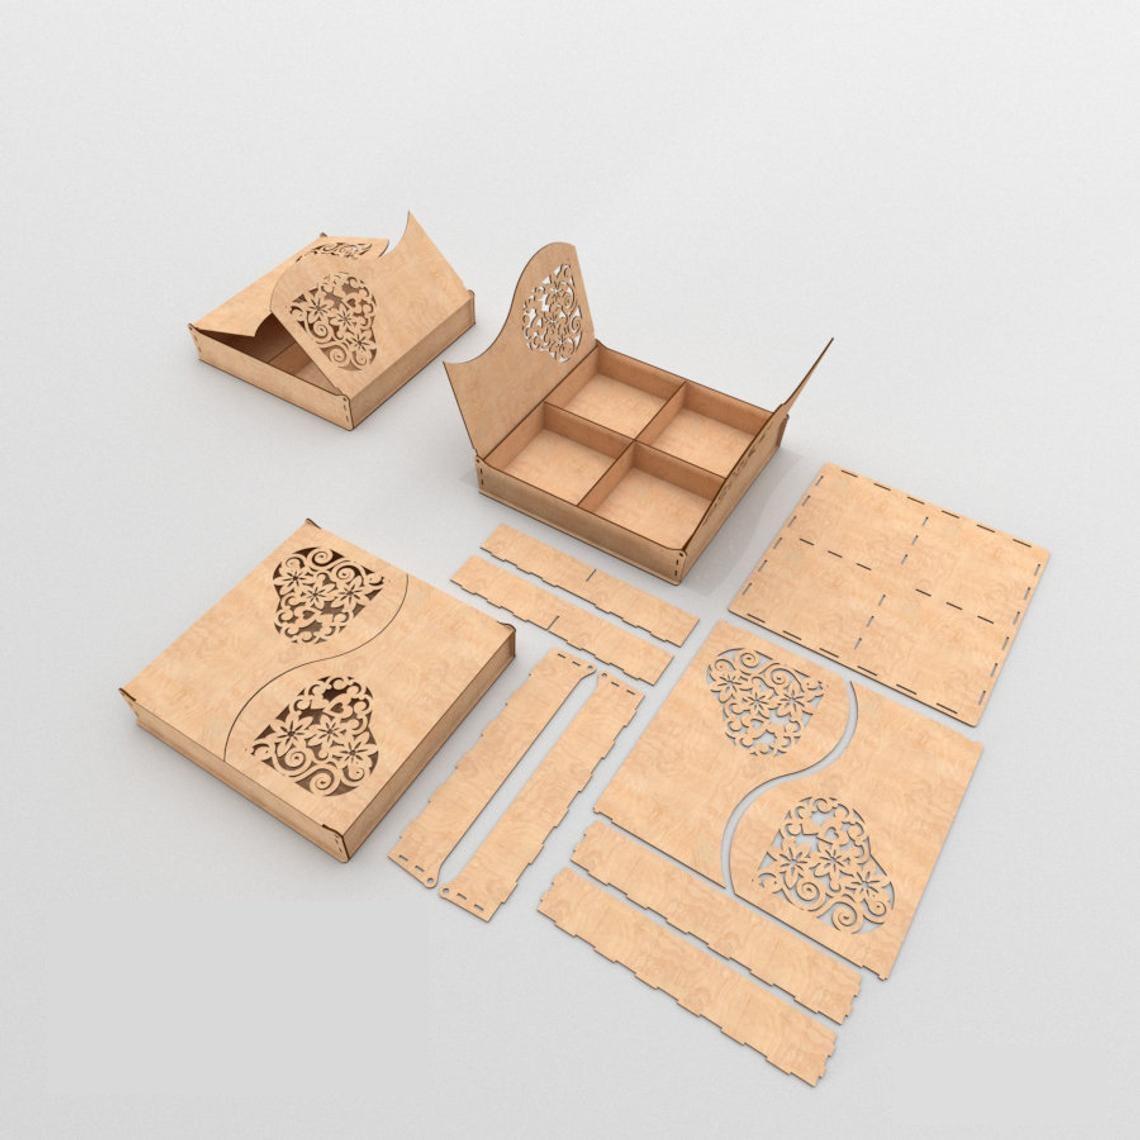 Laser Cut Love Box Wooden Gift Box Free Vector